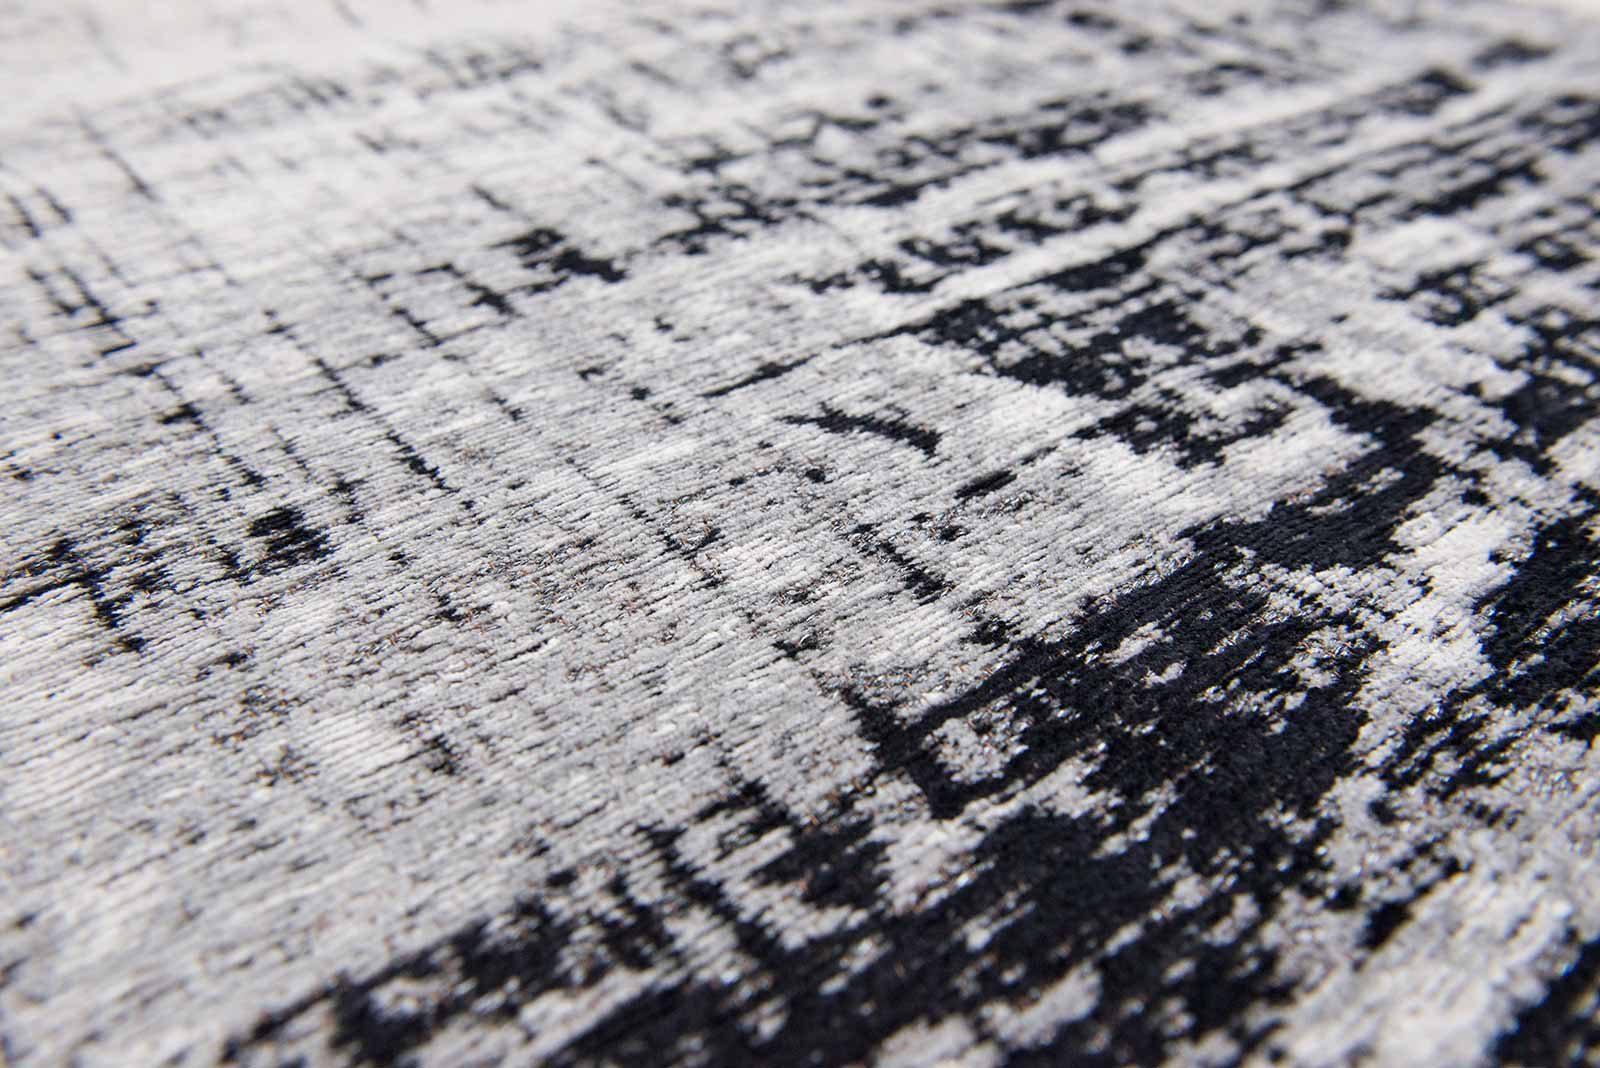 alfombras Louis De Poortere LX8926 Mad Men Griff Metro Black and White zoom